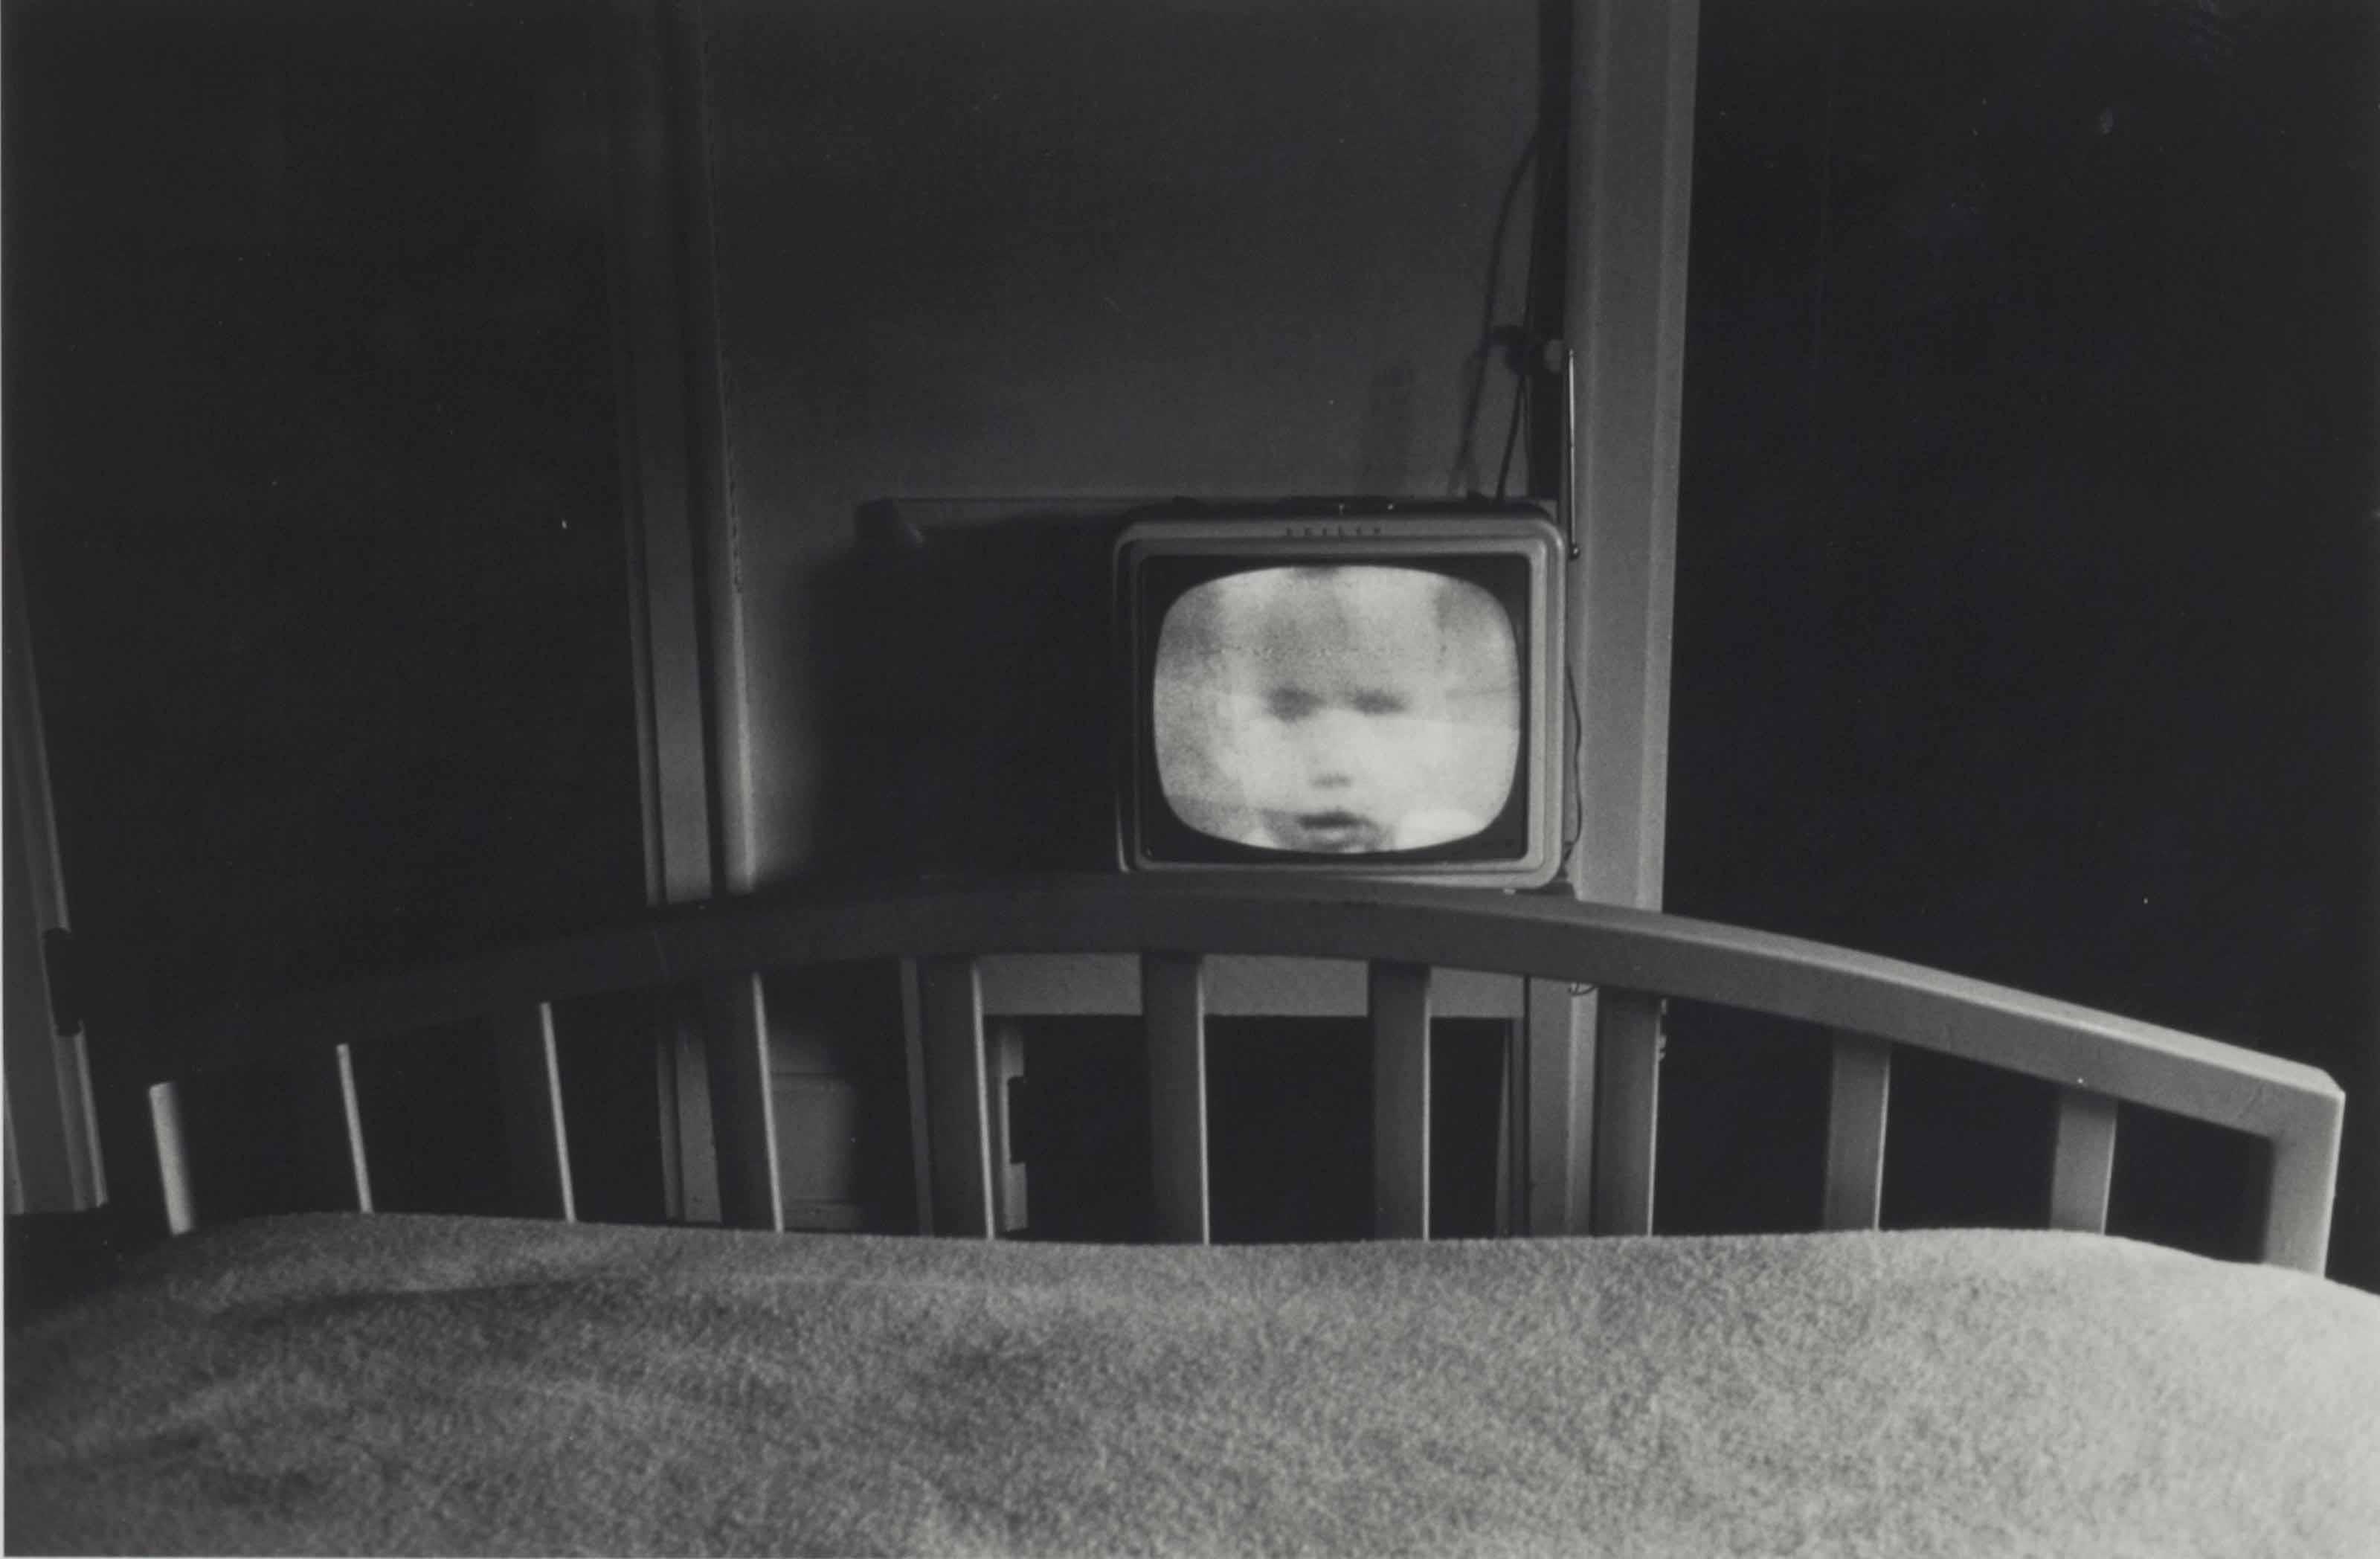 Galax, Virginia, 1962